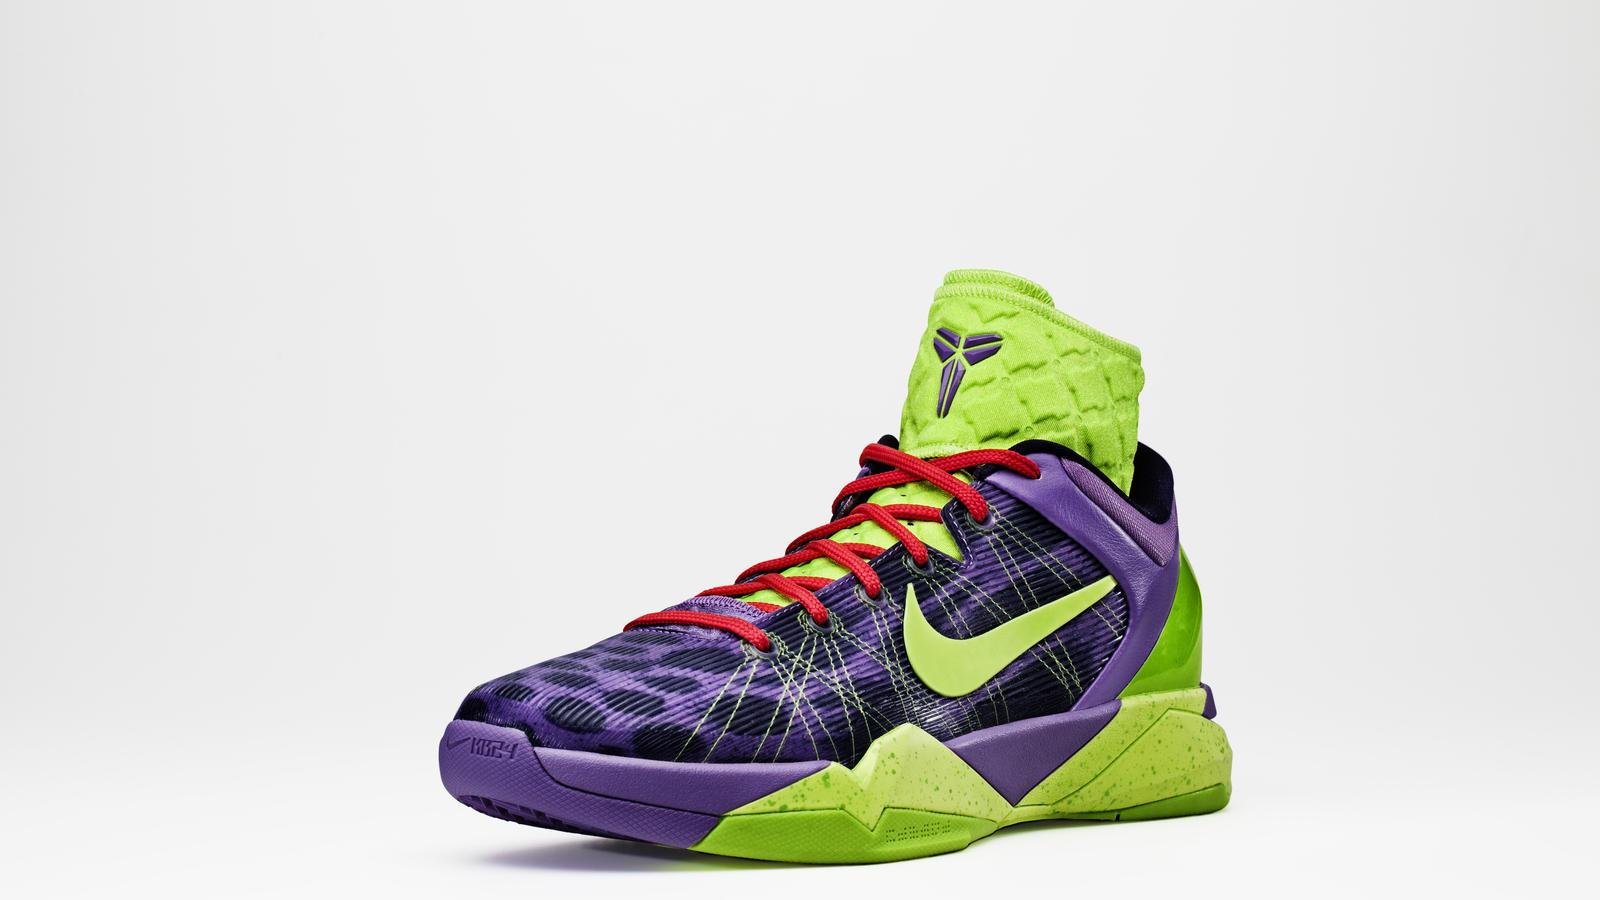 colorful nike basketball shoes